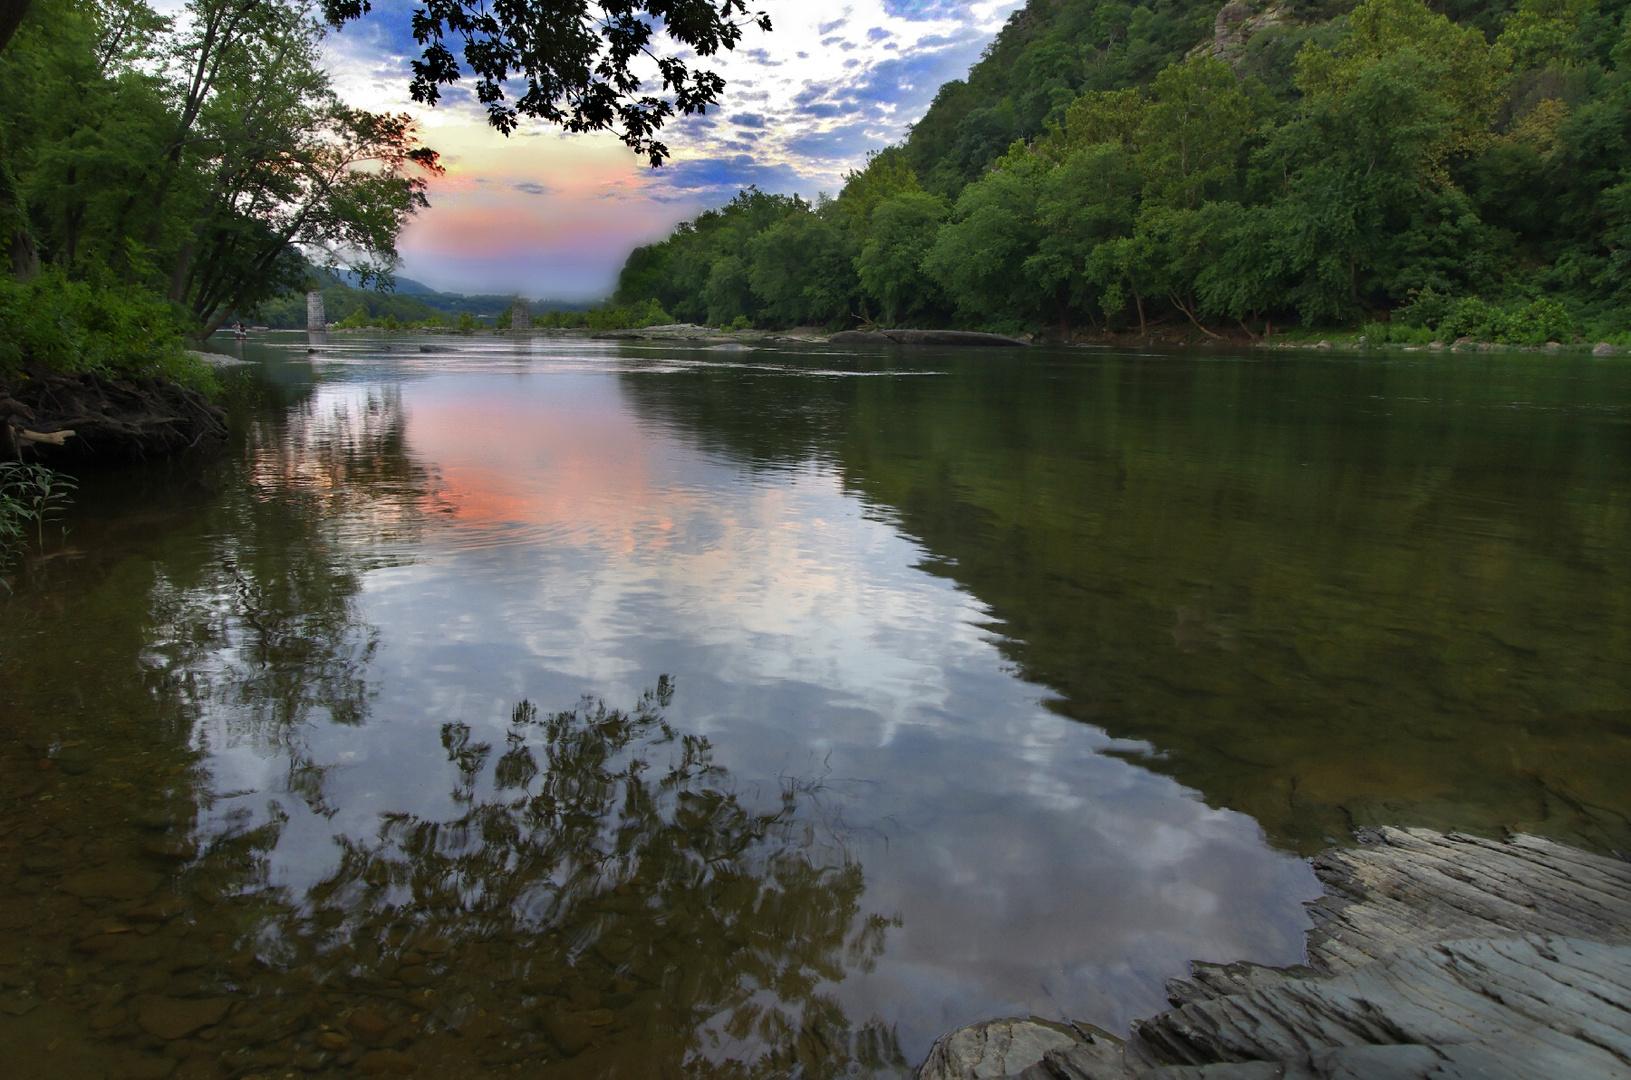 The Shenandoah river at Harper's Ferry (West Virginia)